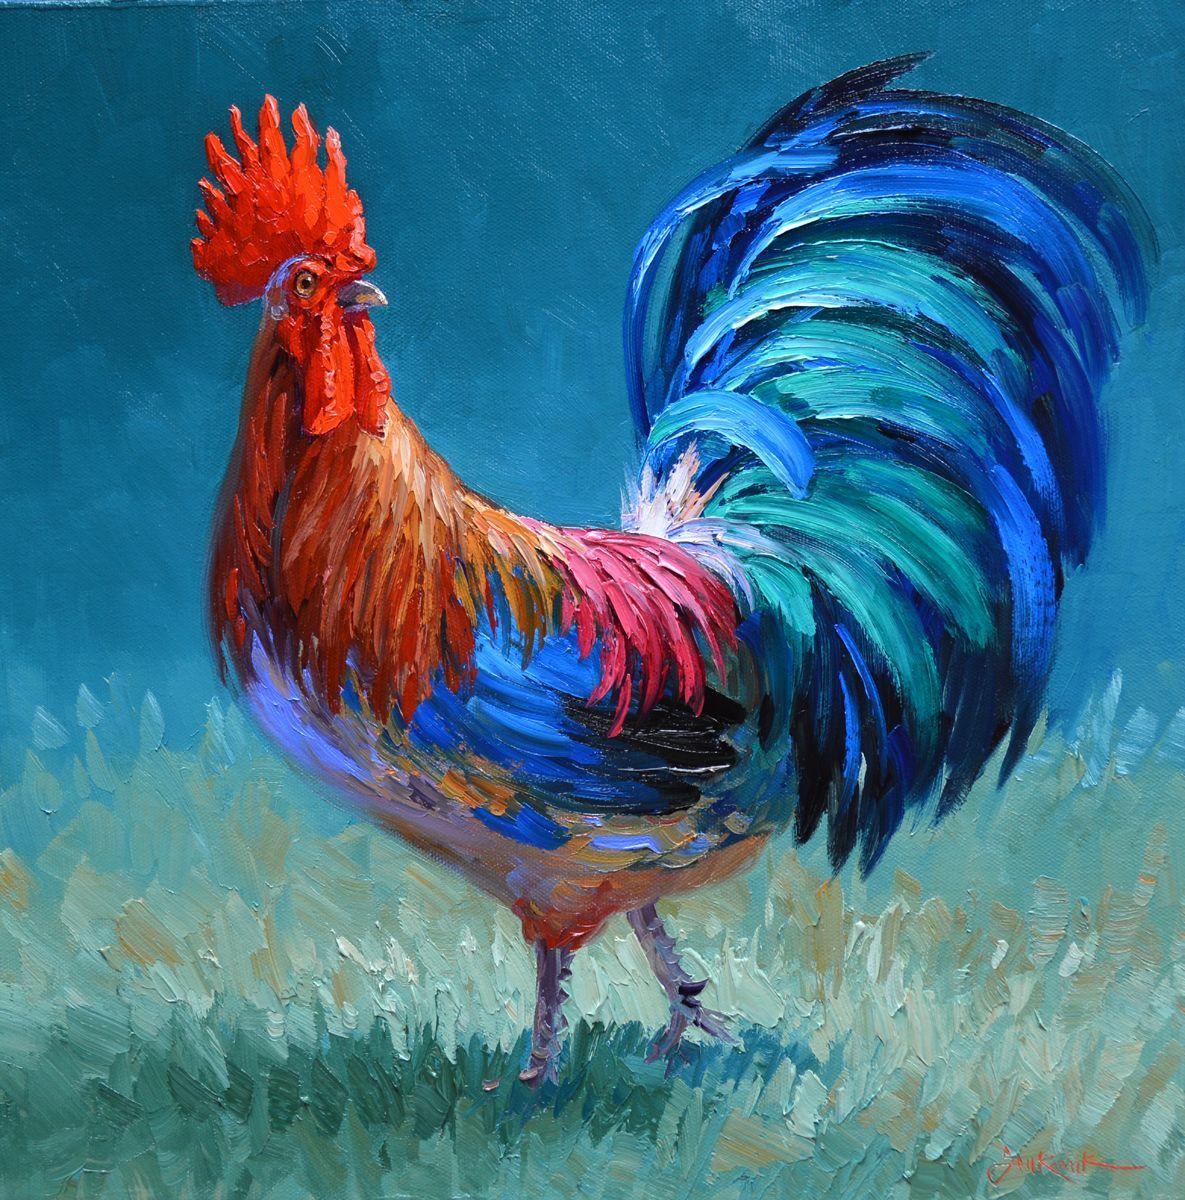 Image Result For Easy Acrylic Painting Ideas Doves Tablolar Resim Cizimler